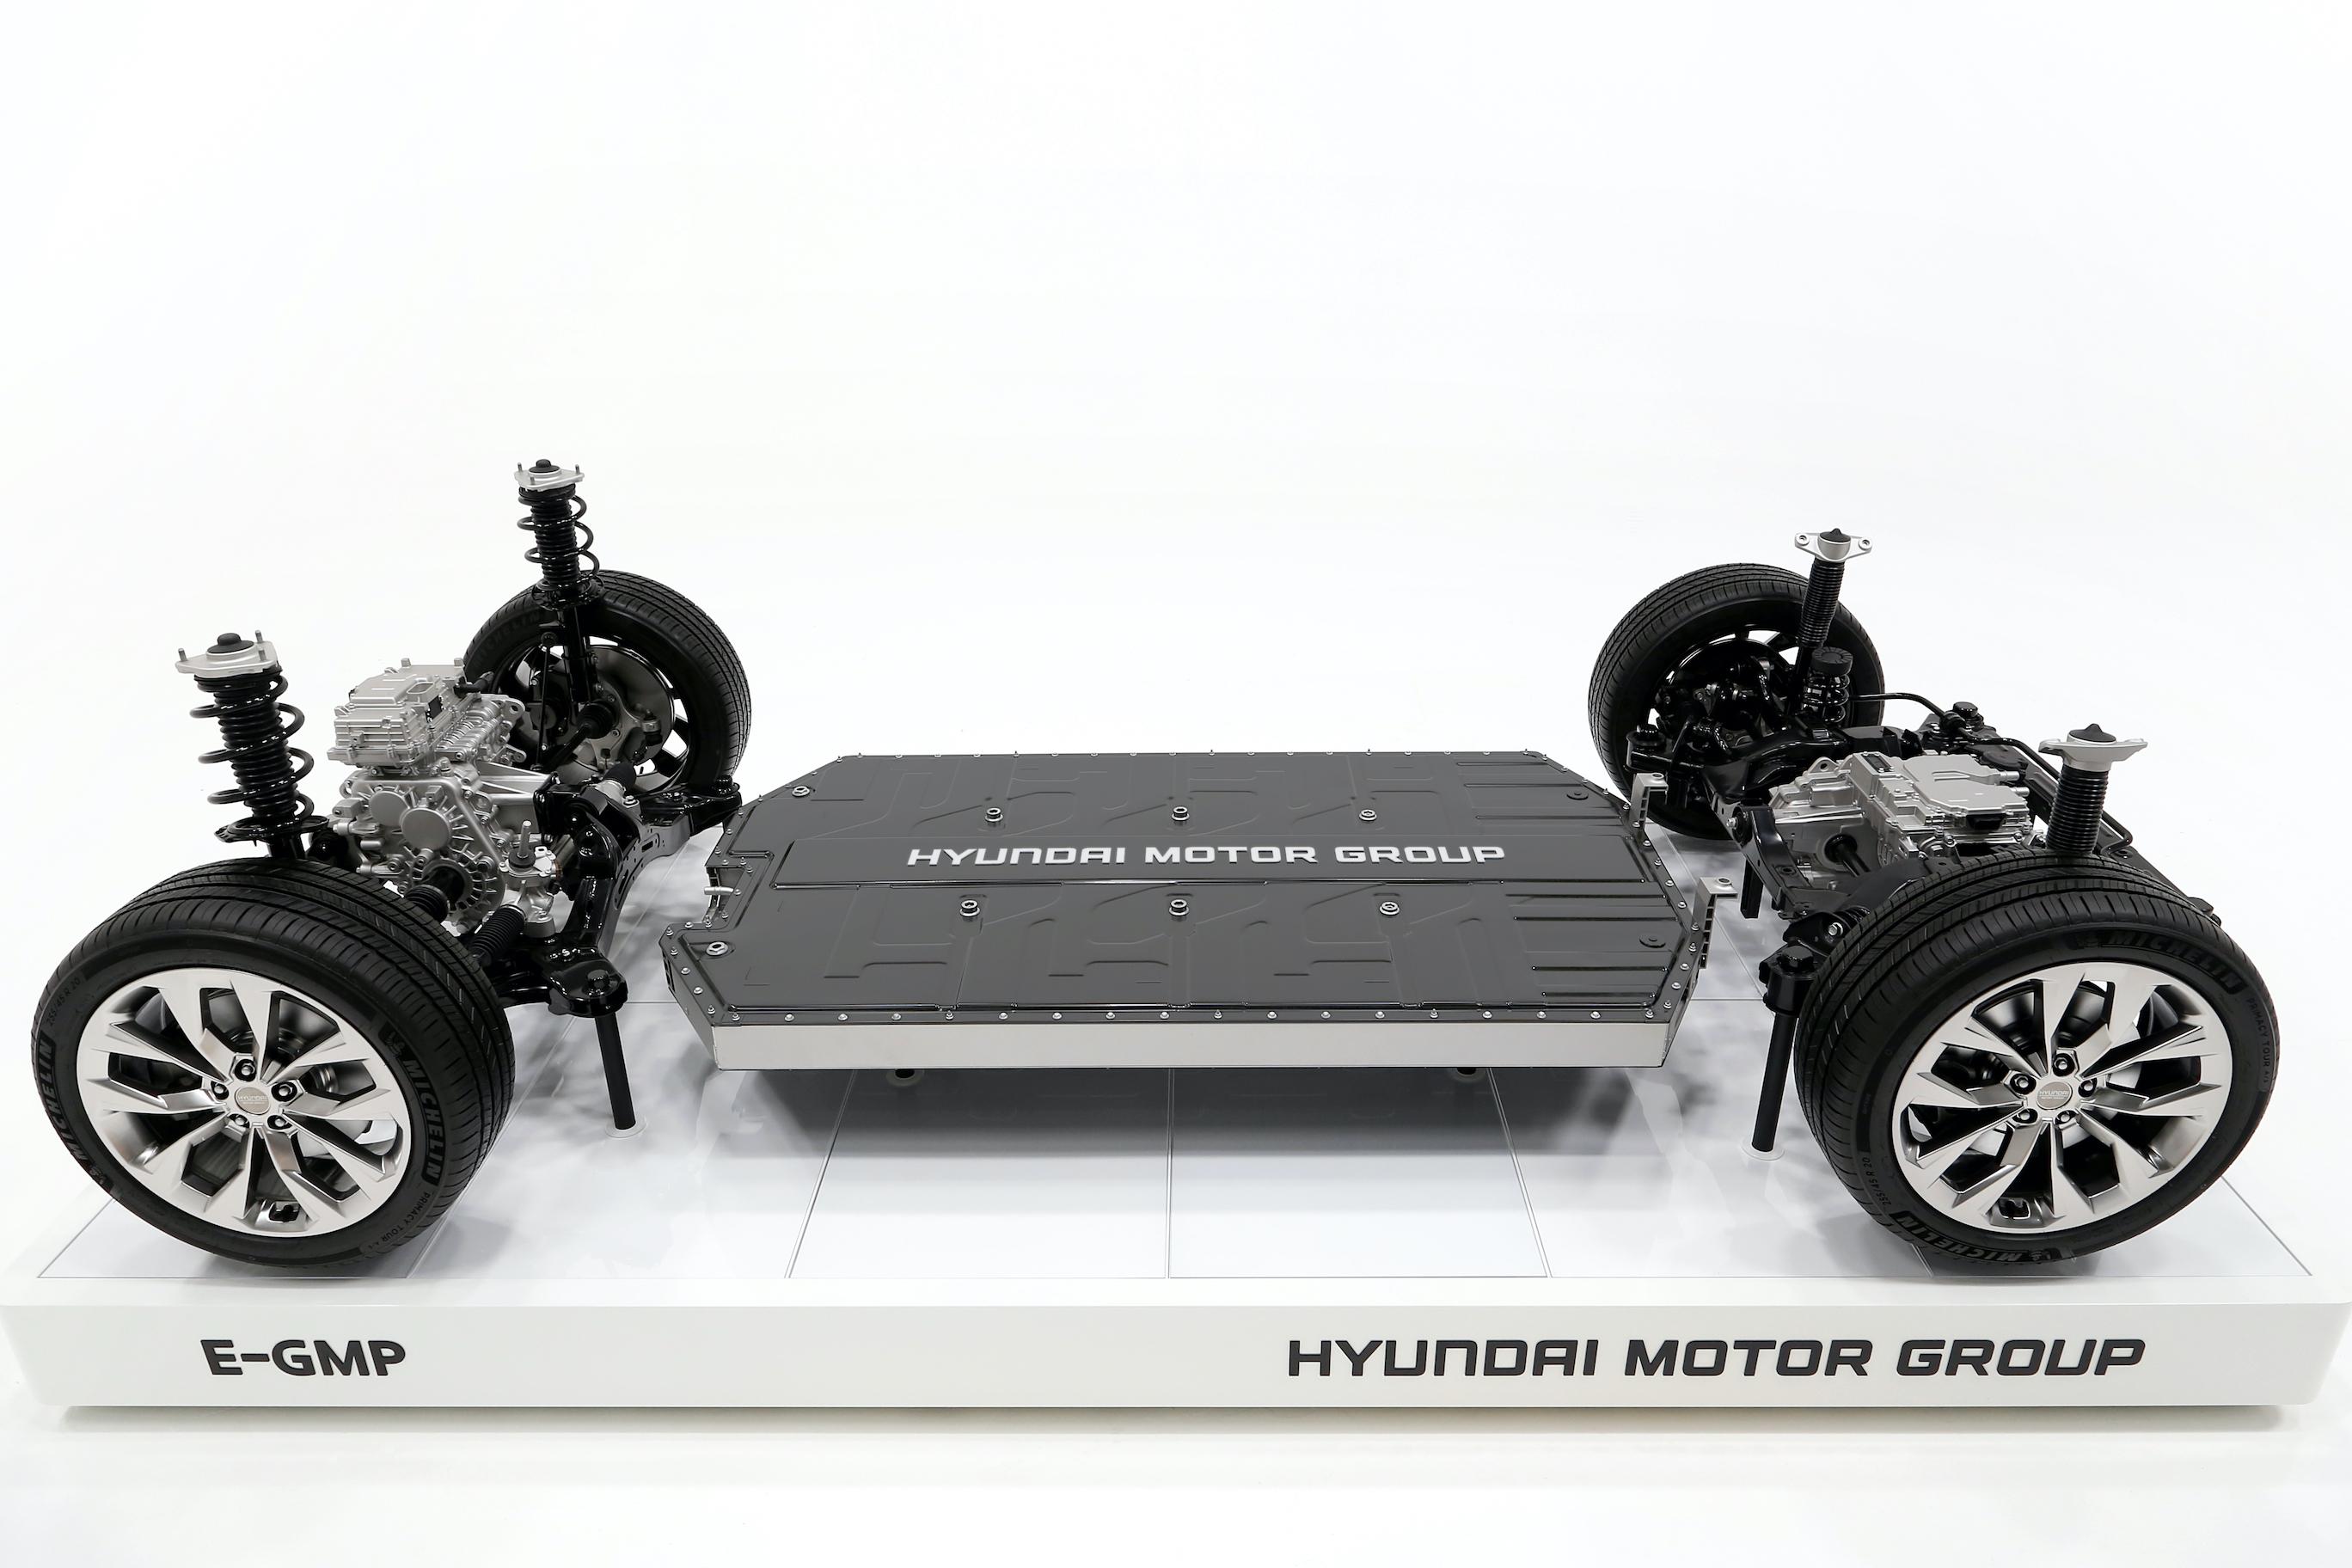 Hyundai and Kia Won't Build Apple's Self-Driving Car After All - Motley Fool